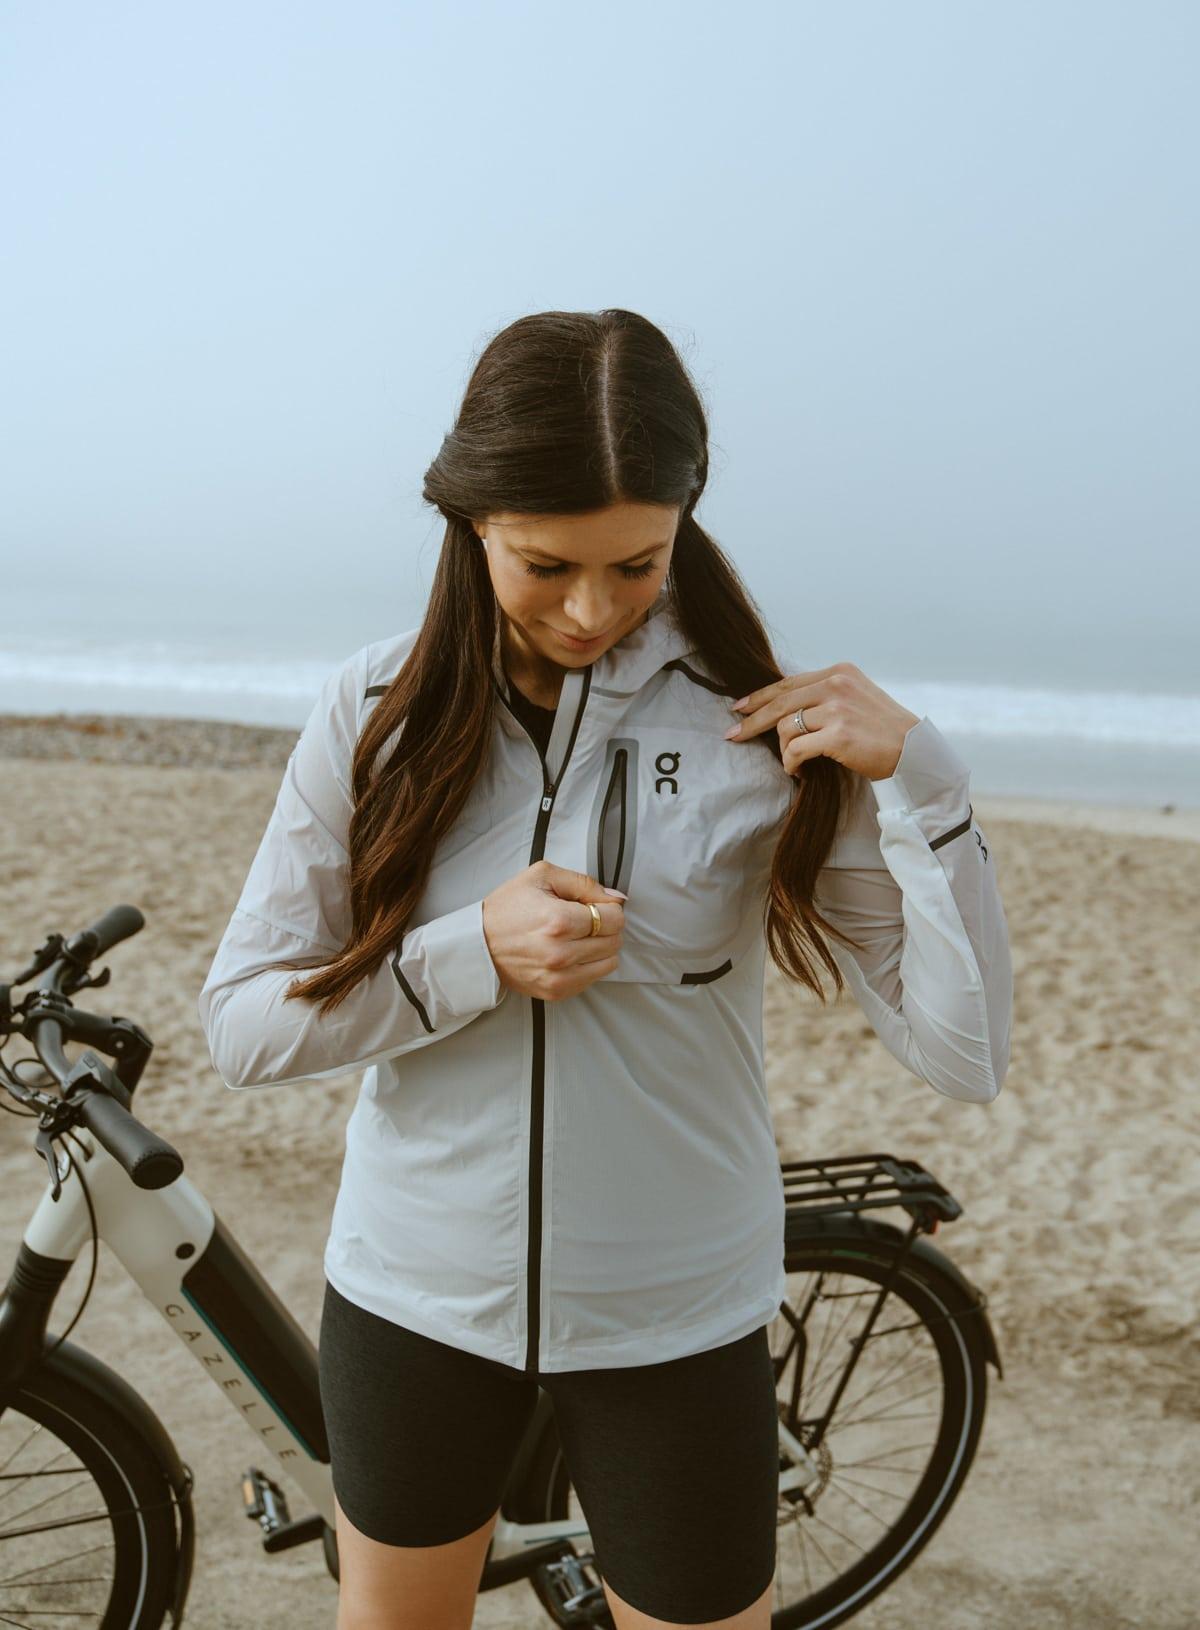 reflective jacket for bike rides